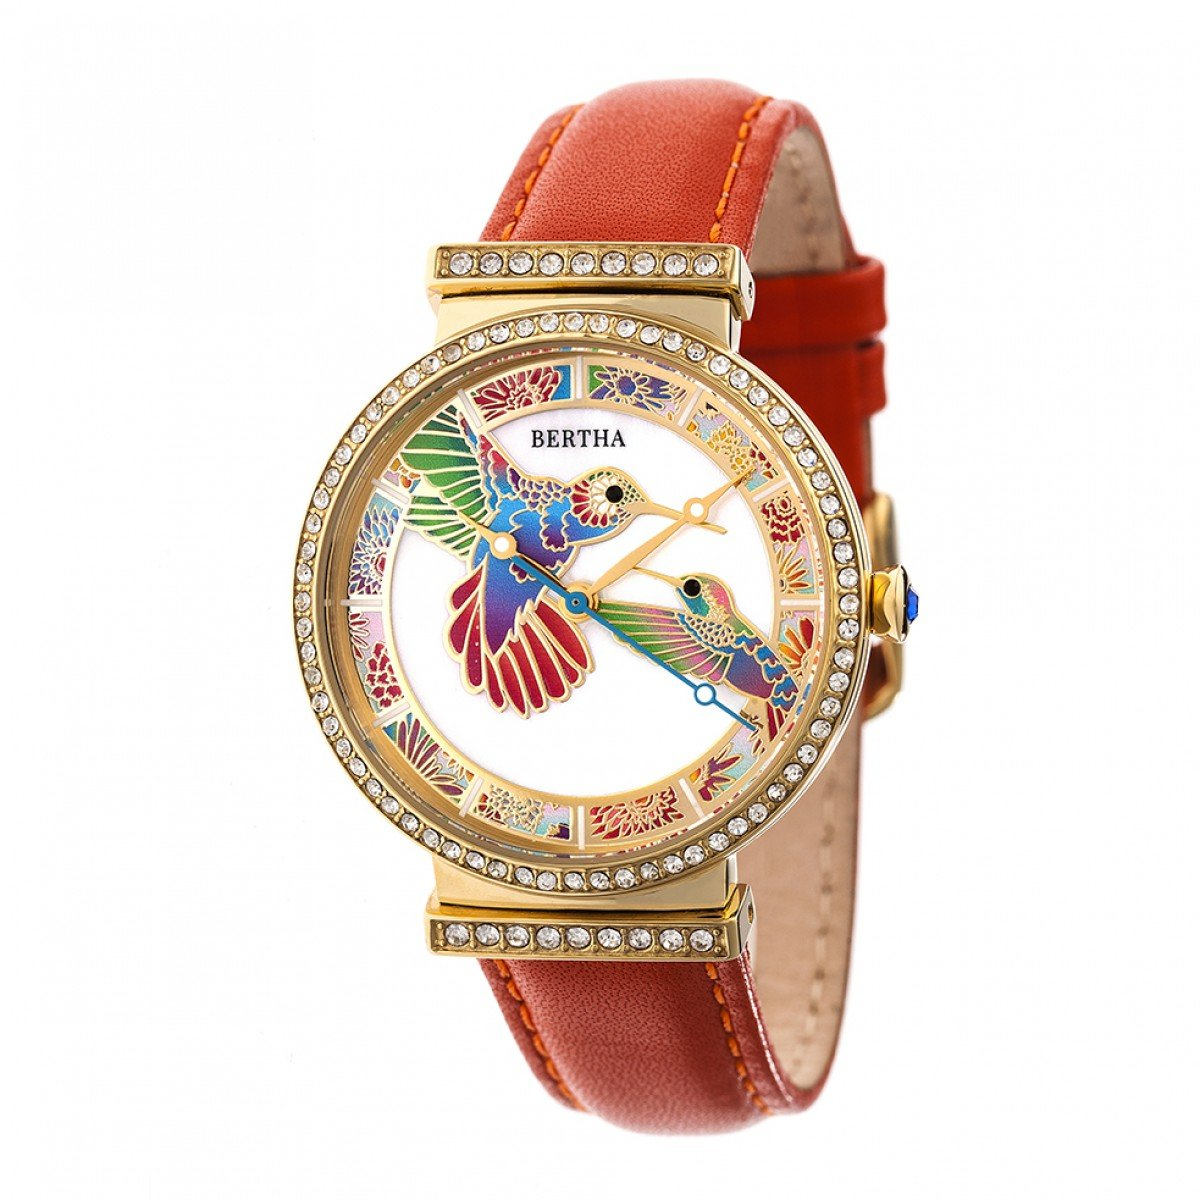 Bertha Emily Mop leather-band腕時計 – ゴールド/オレンジ B077S3NTYM